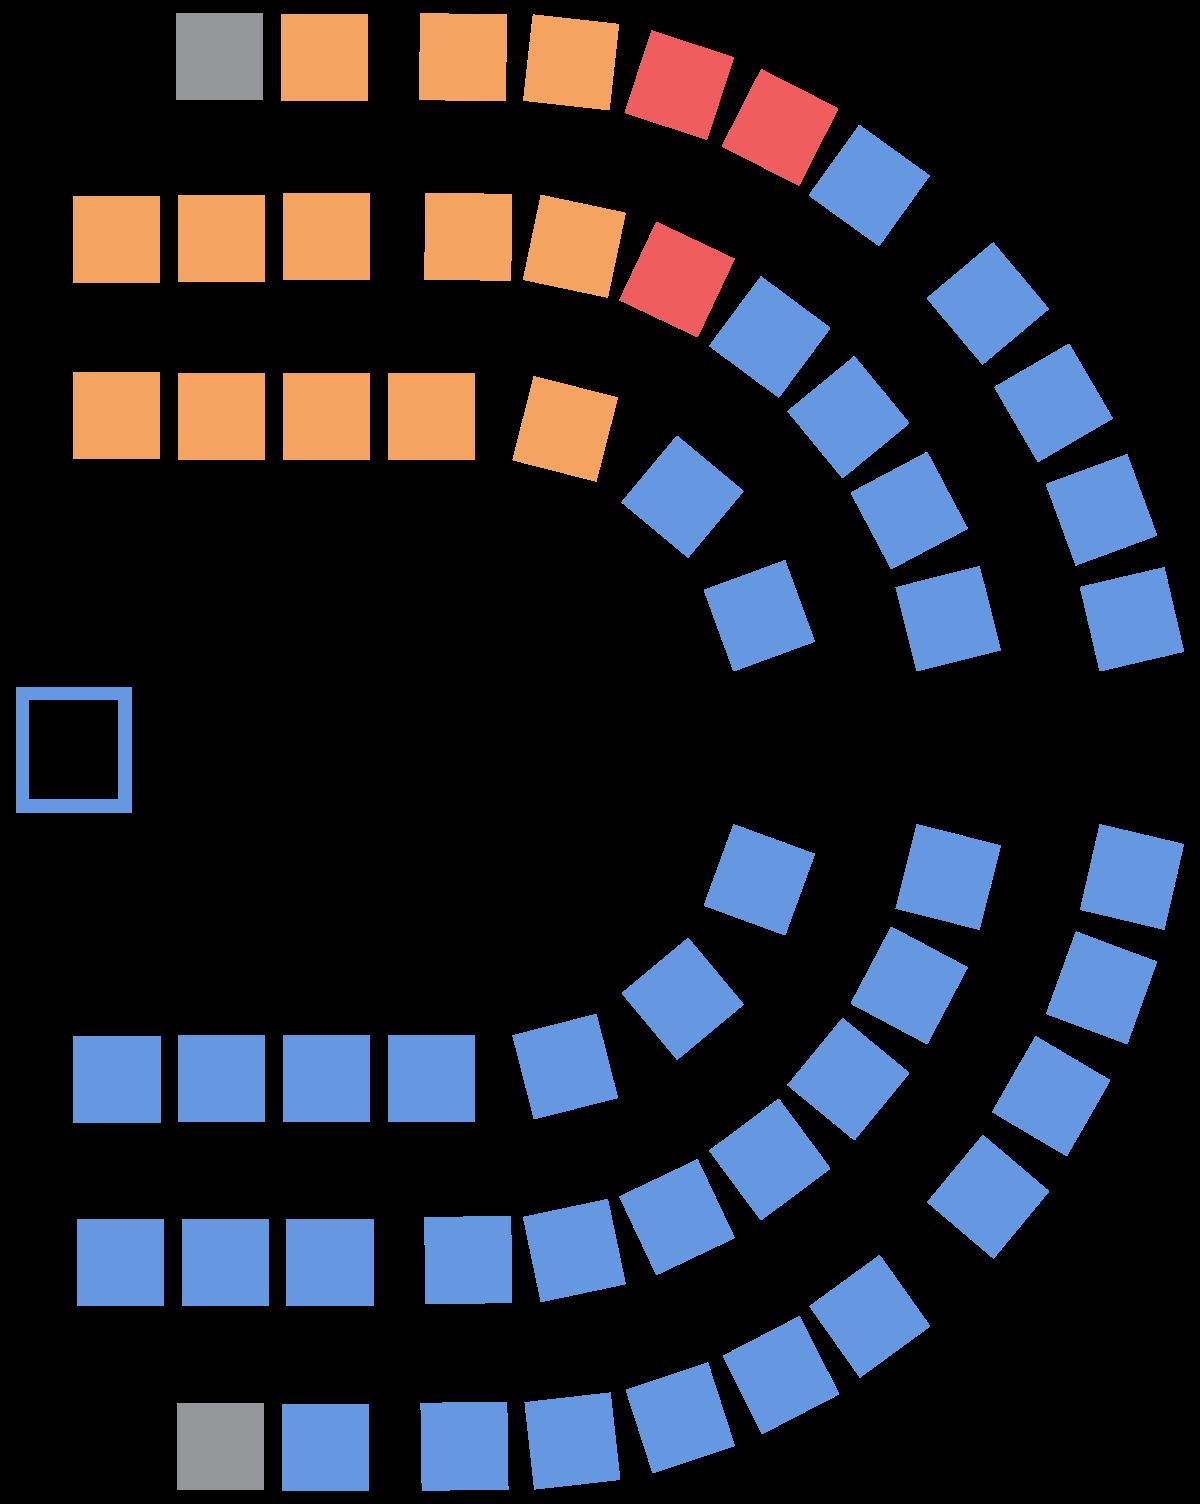 Democracy clipart legislative leader. Assembly of manitoba wikipedia